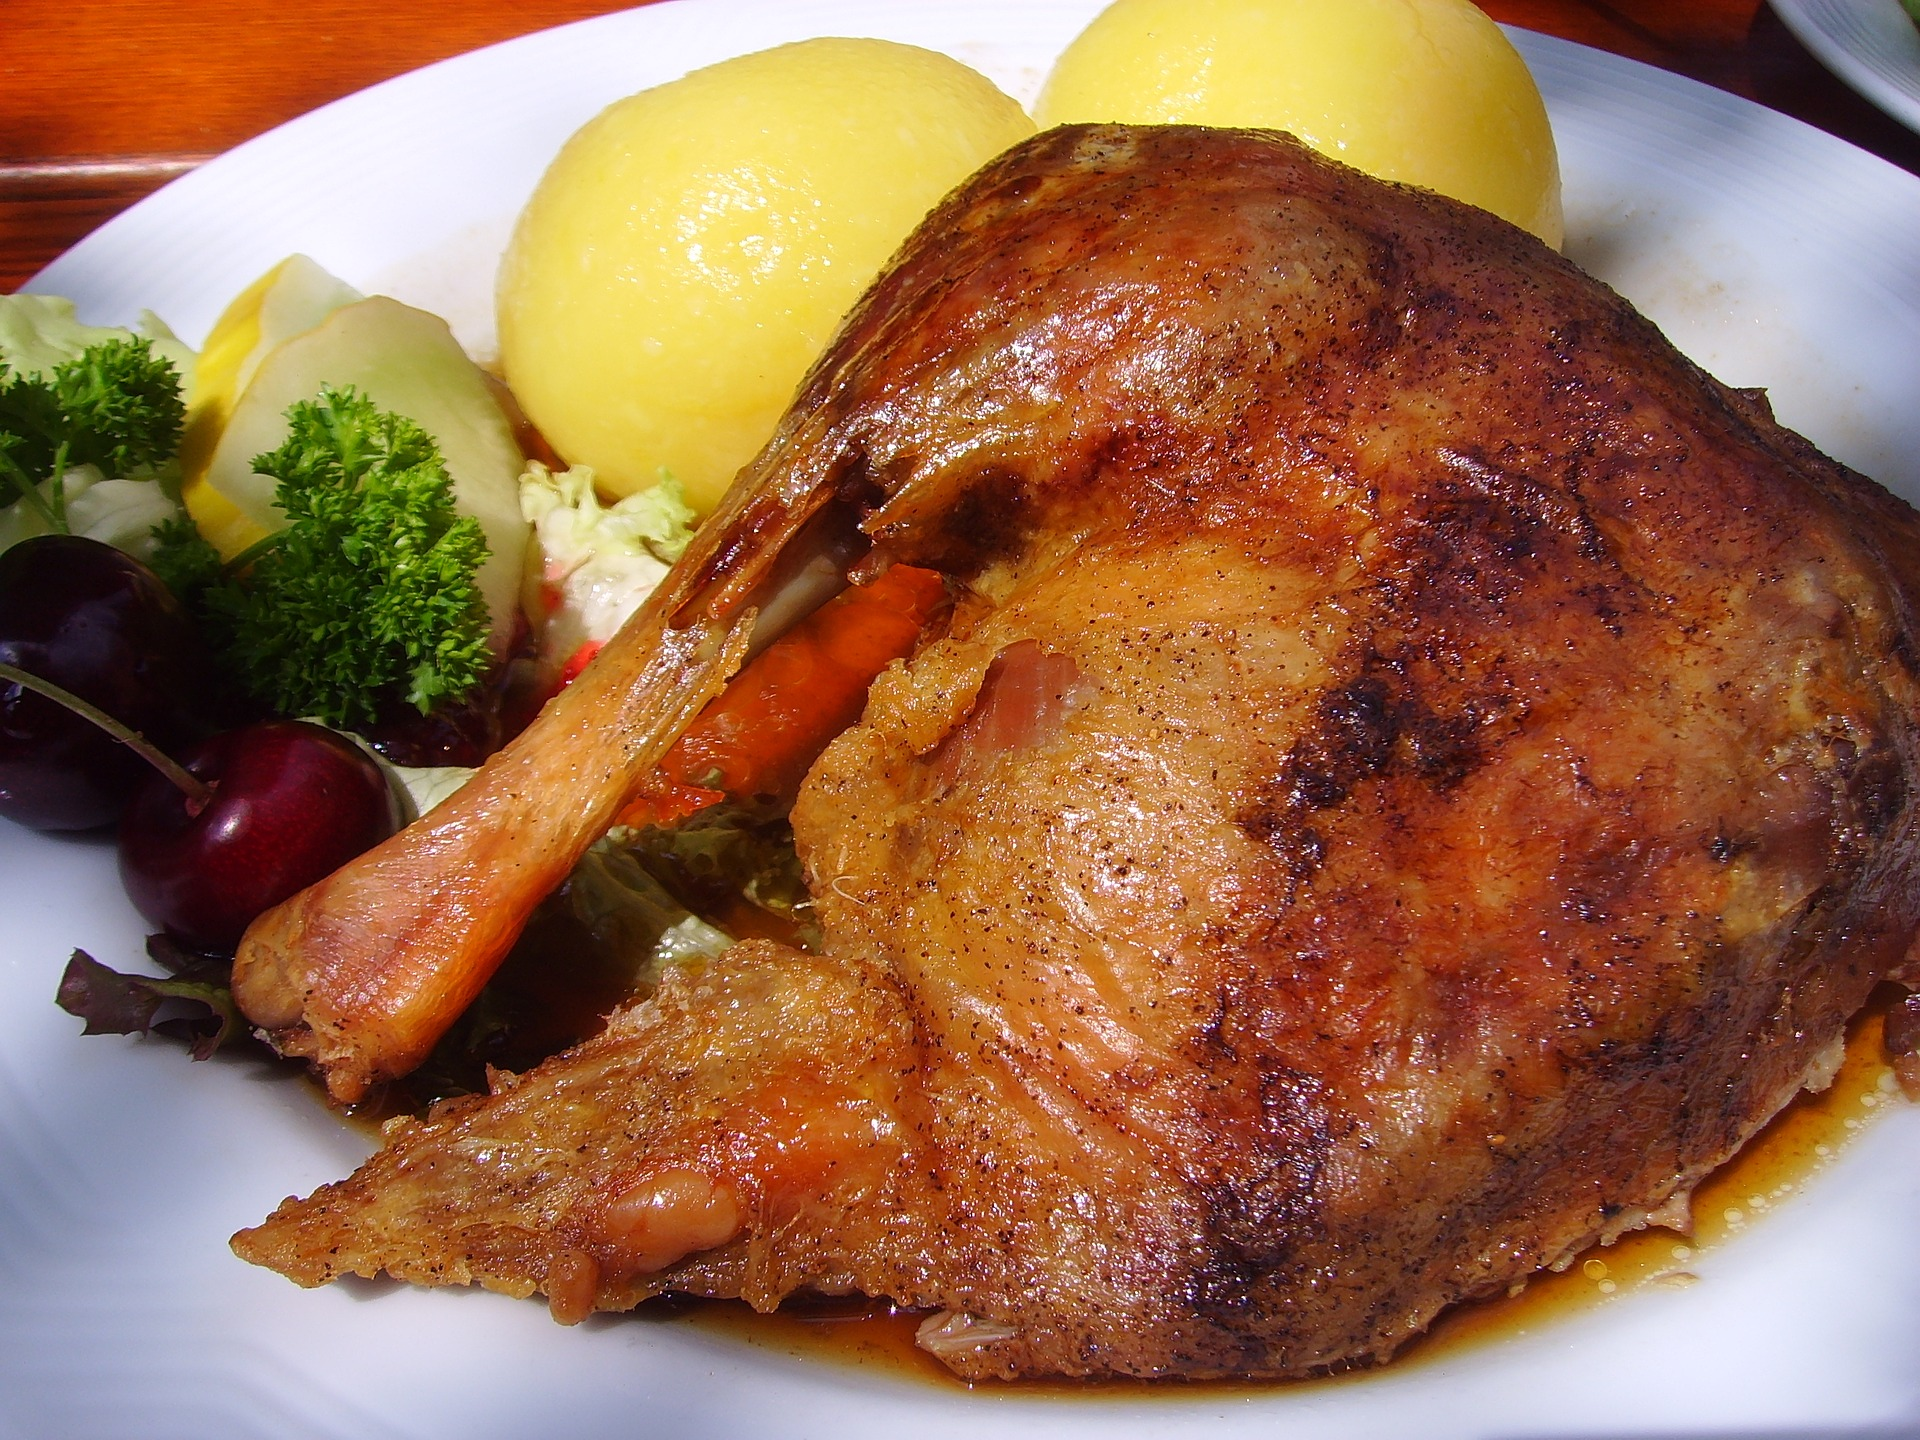 An image of roast goose